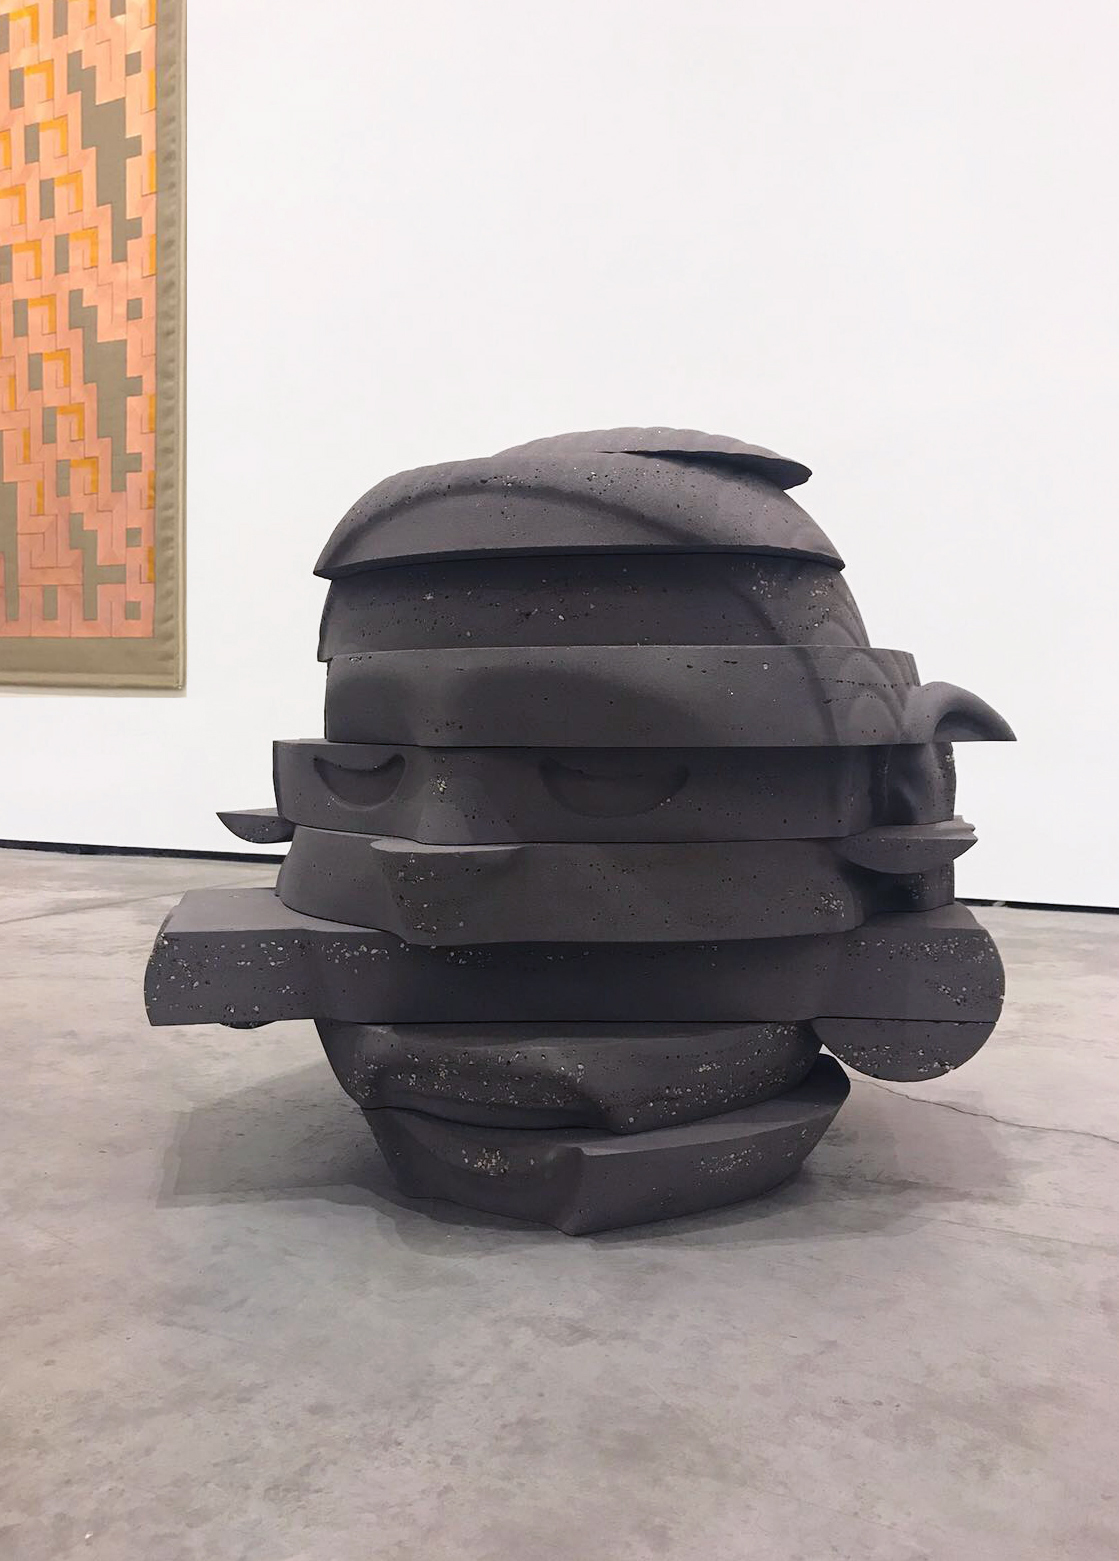 'Compression Loss (Thoth)', 2017   Troika (Conny Freyer, Eva Rucki, Sebastien Noel)